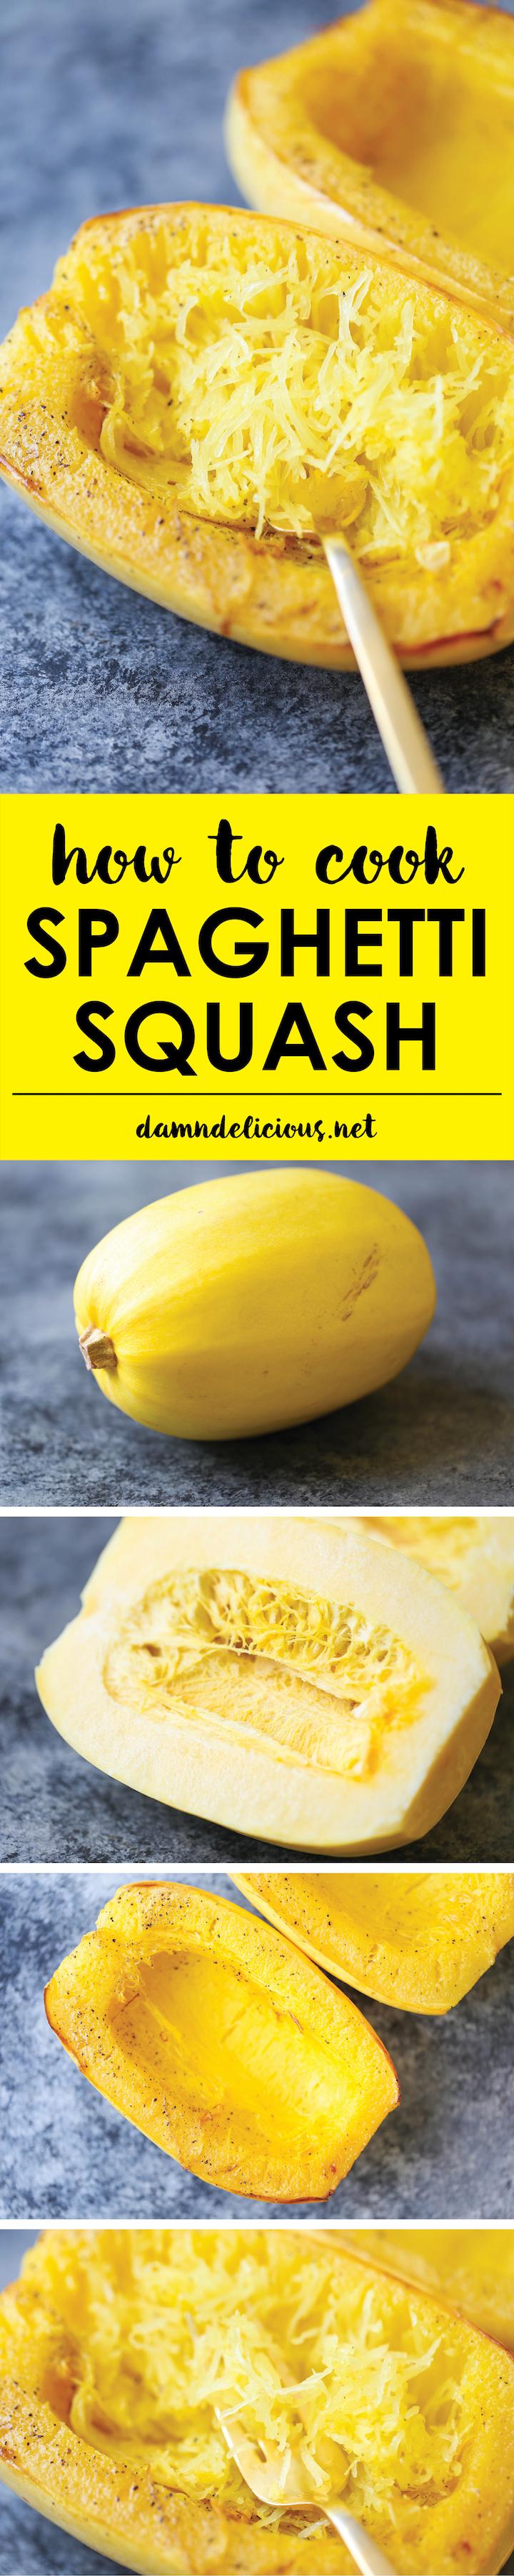 How To Cook Spaghetti Squash Damn Delicious